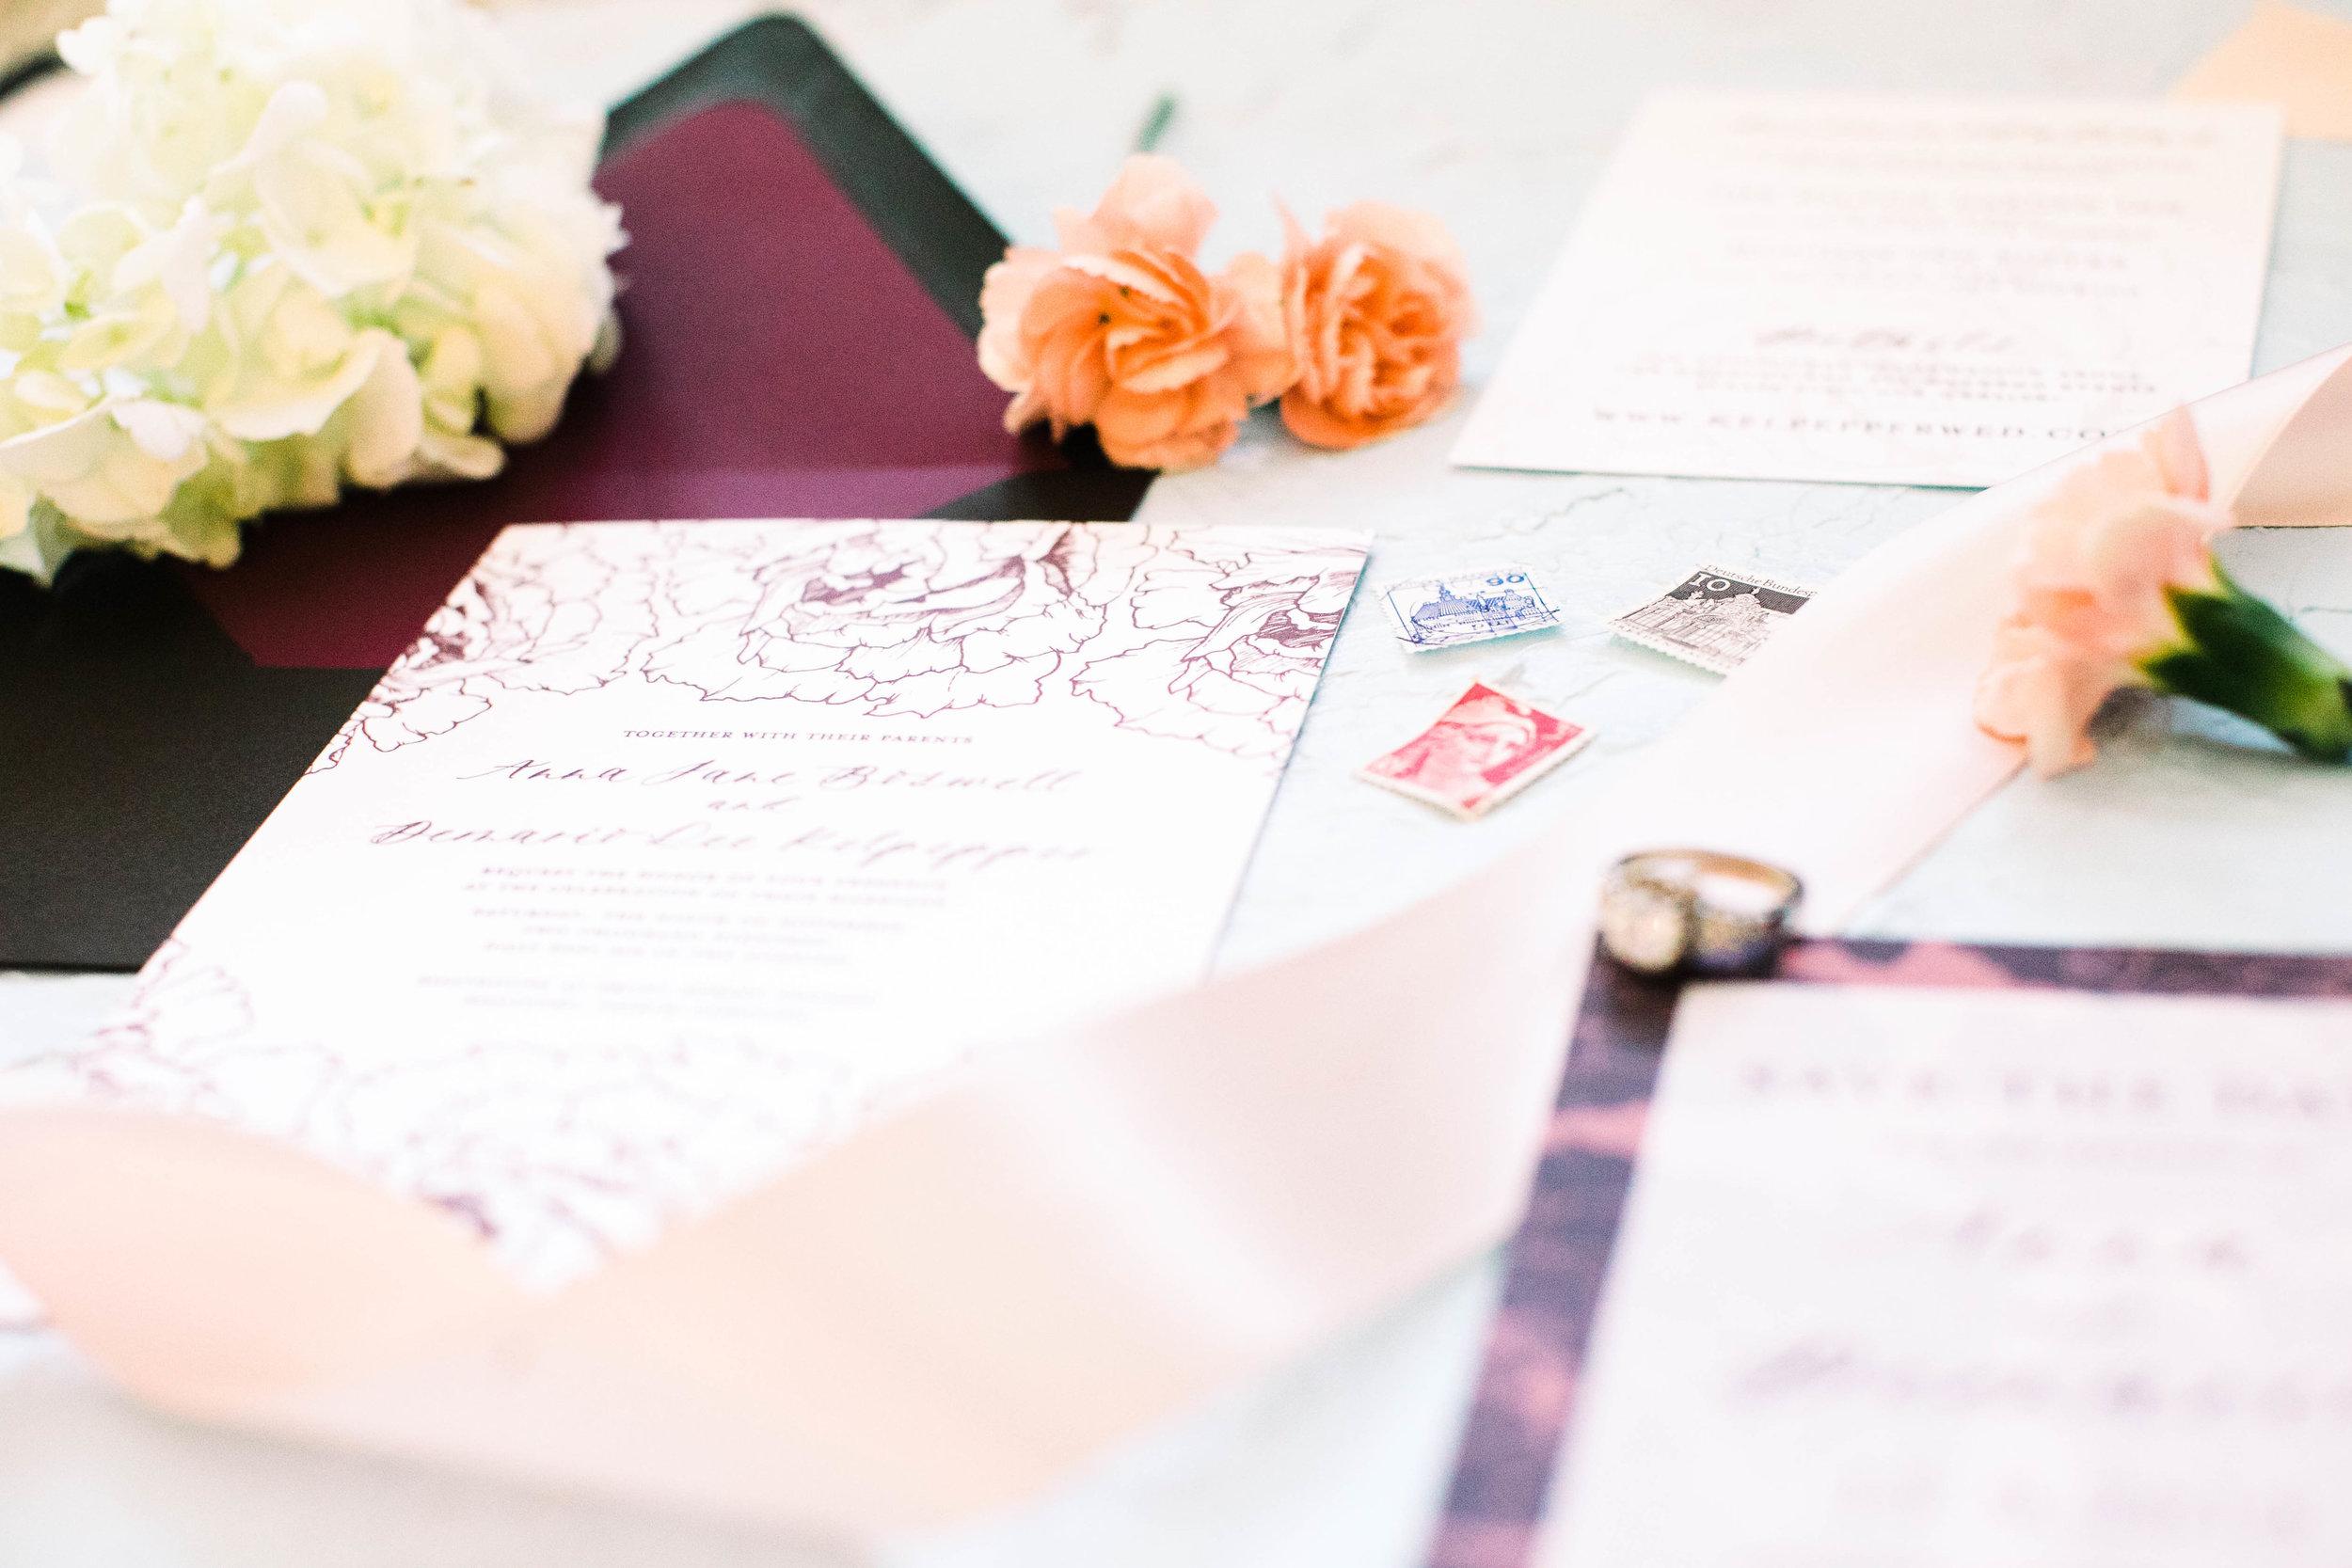 Anna Hand Drawn Wedding Invitation Burgundy Peonies Feathered Heart PrintsAnna 3W2A0391.jpg